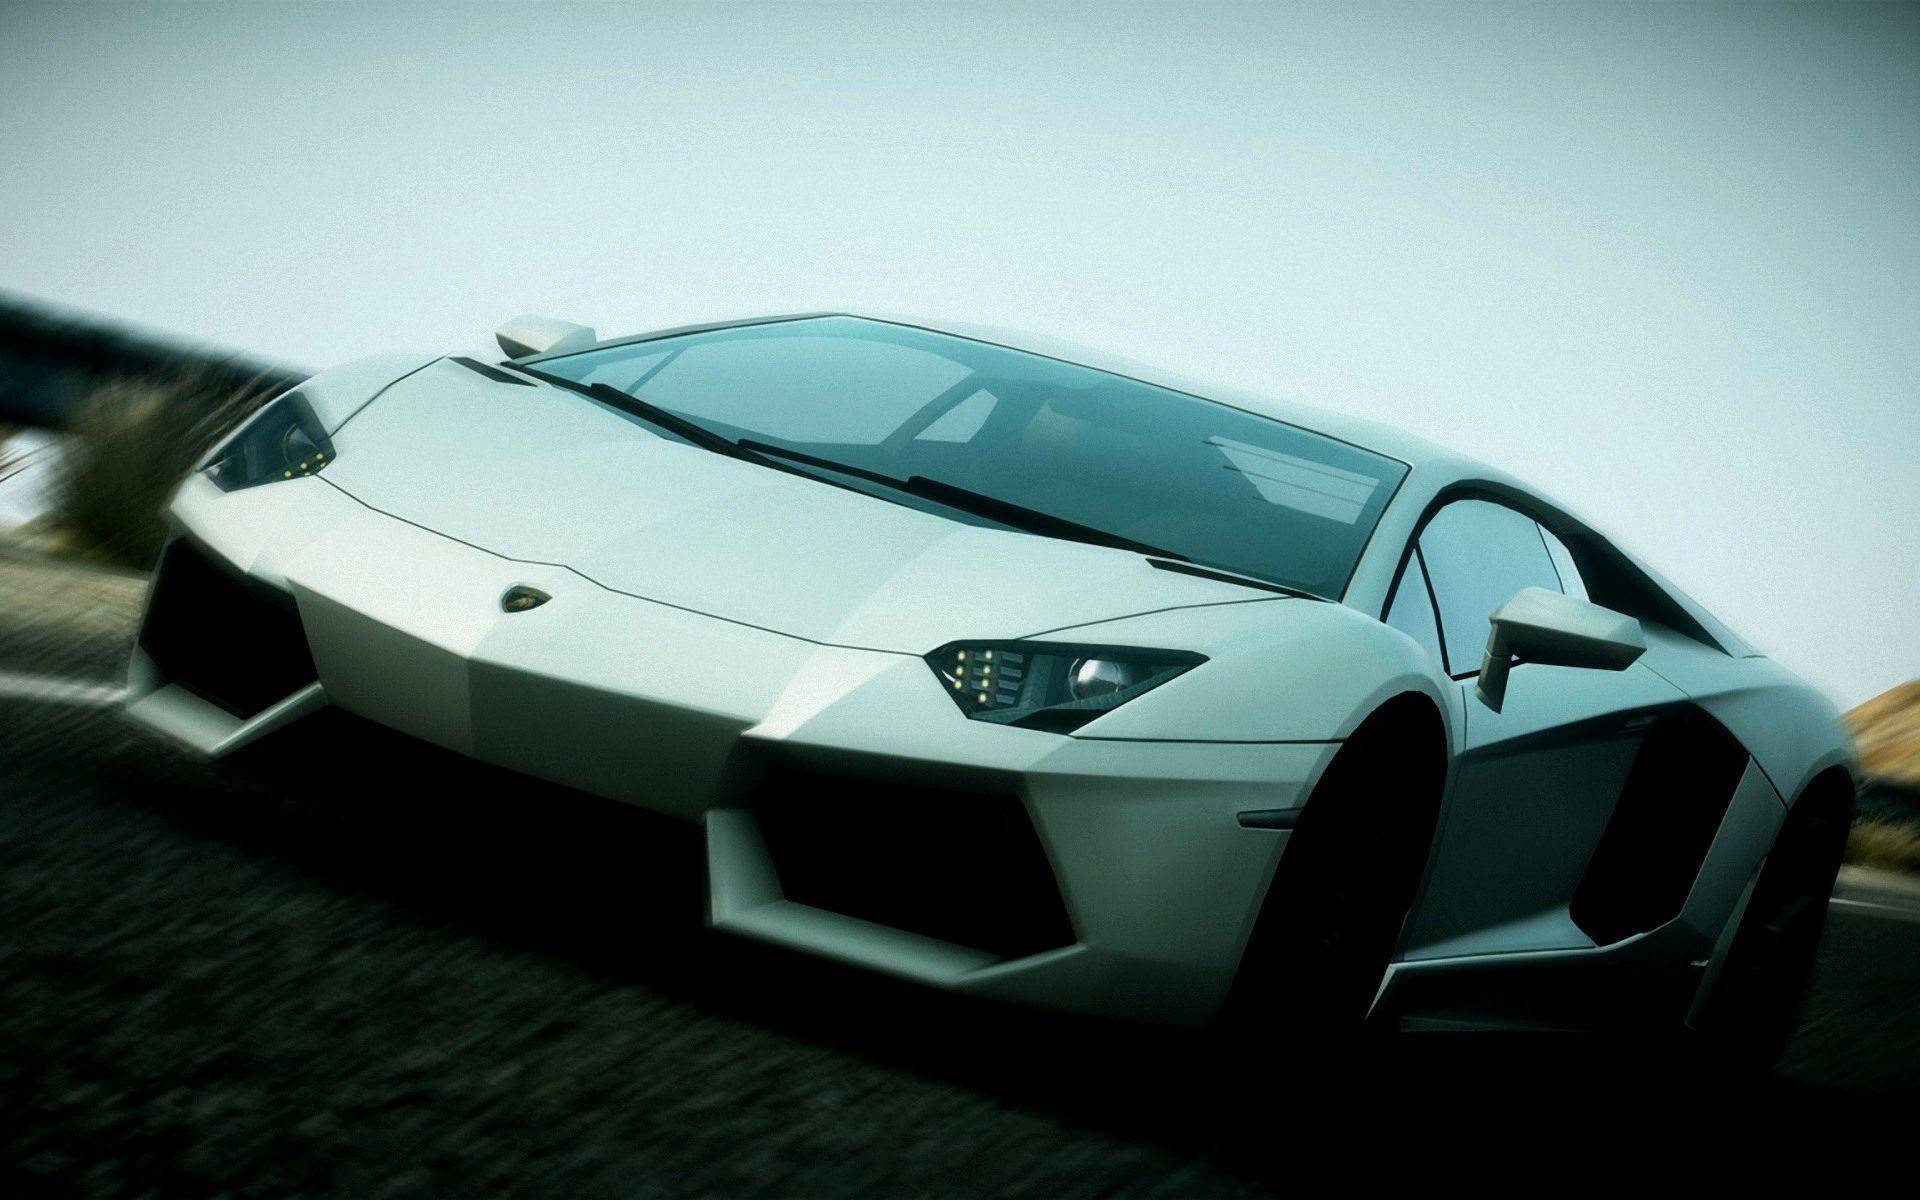 Lamborghini Veneno Wallpapers 64 Images